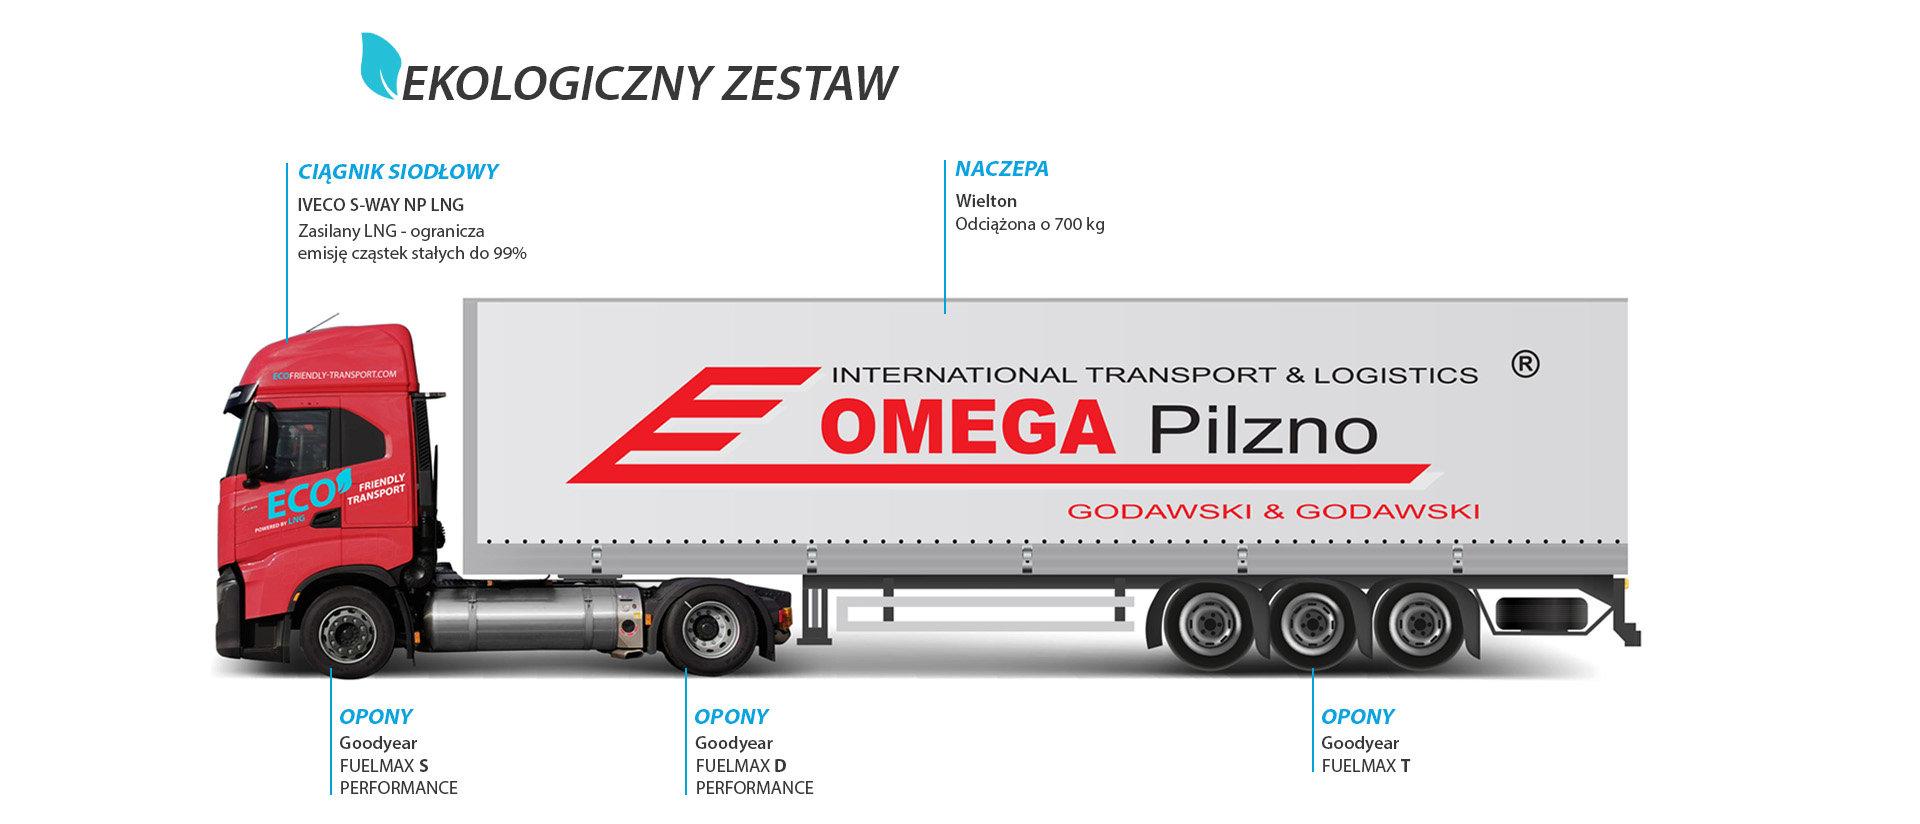 Ekologiczny zestaw Fot. Omega Pilzno.jpg